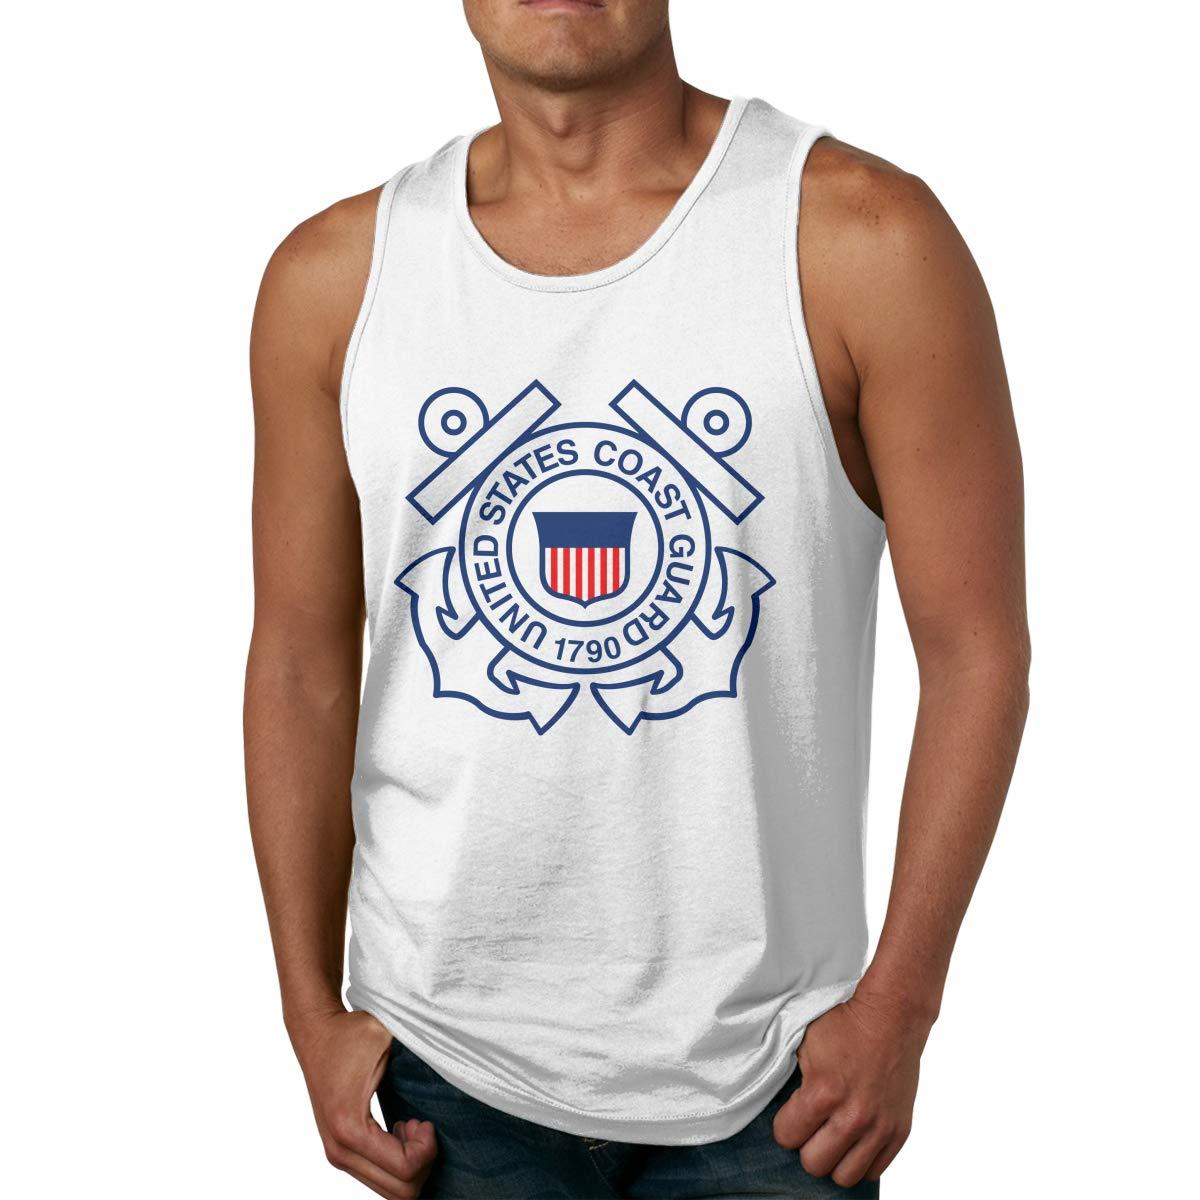 San Francisco Fleet Week Logo Mens Printed Vest Sports Tank-Top Tee Leisure Sleeveless Shirt